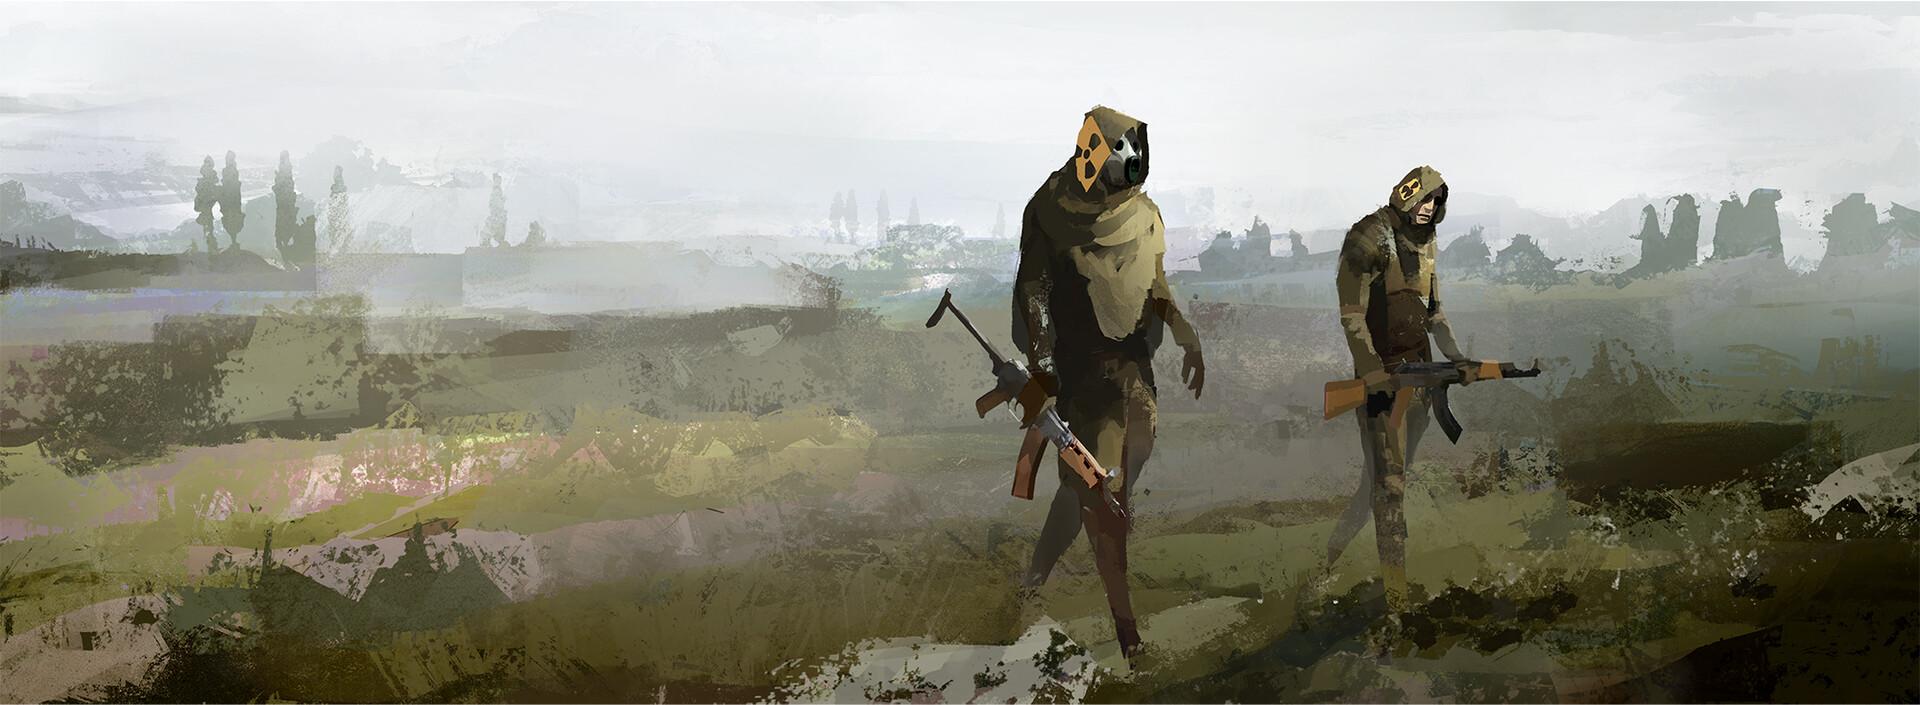 Jaromir hrivnac stalker strelok 05